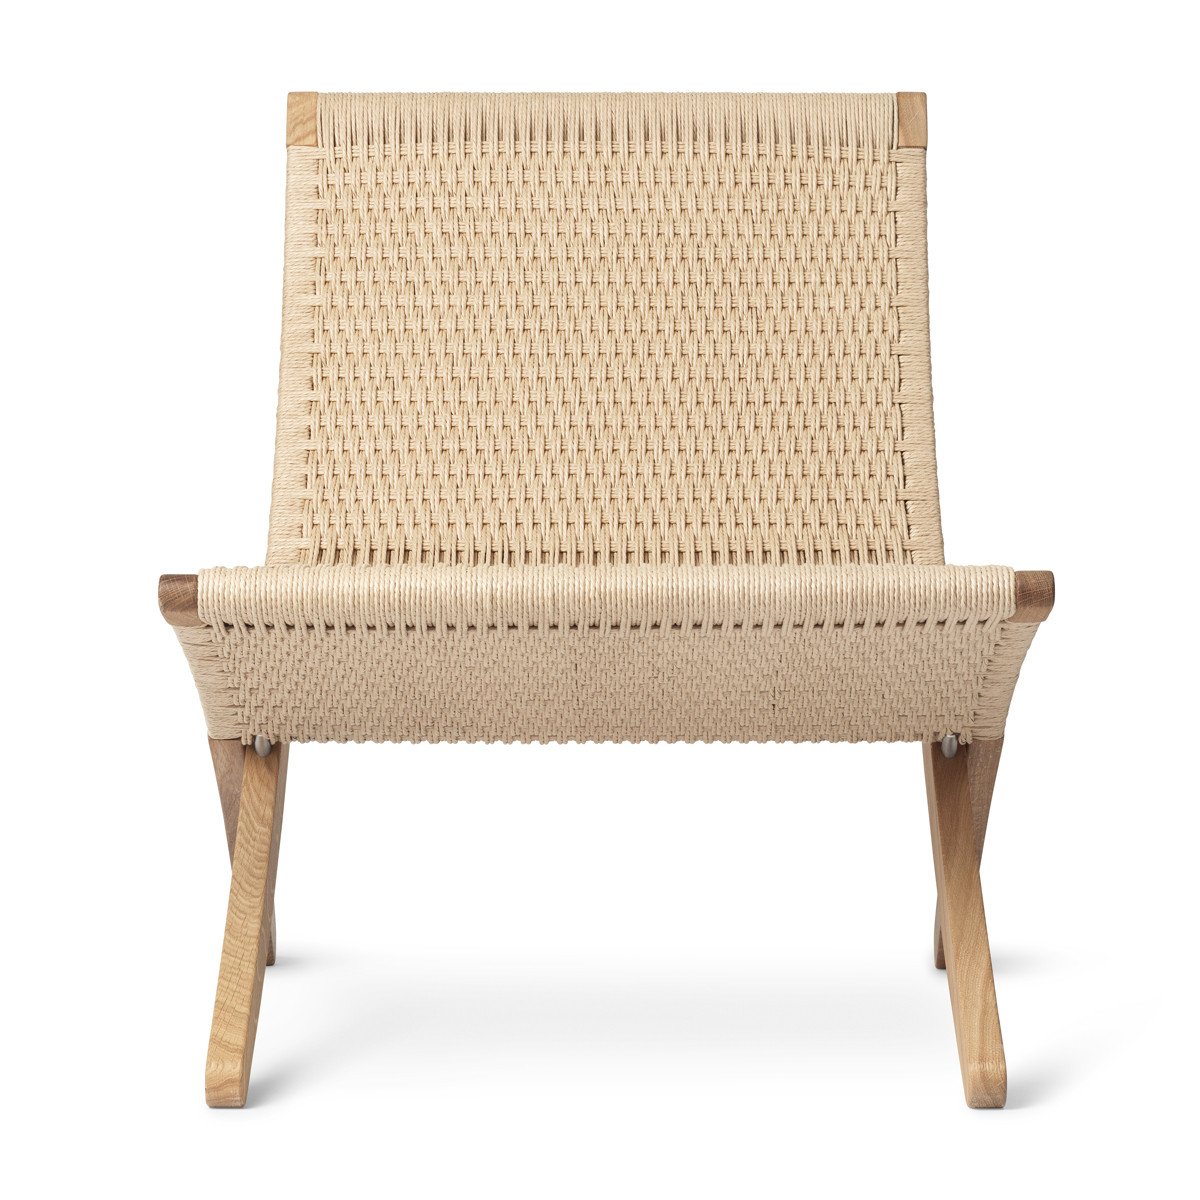 Carl Hansen MG501 Cuba Chair - Paper Cord